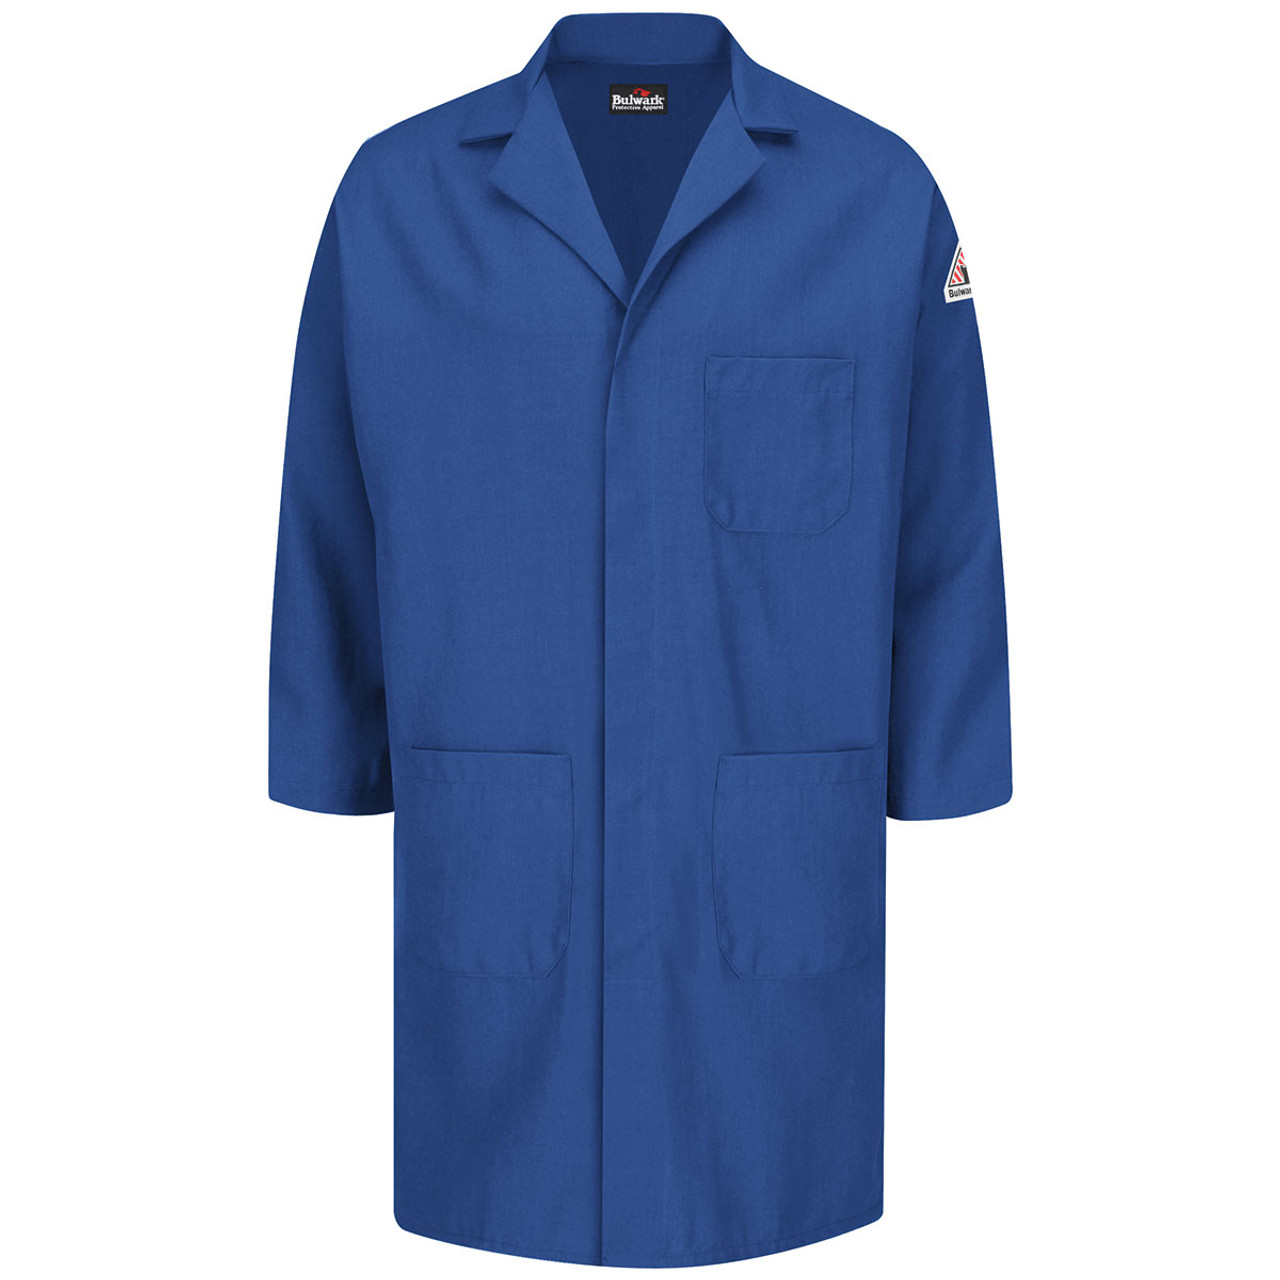 dcd1ce46bbc0 Bulwark FR 6 oz. Nomex Lab Coat KNL6RB Front